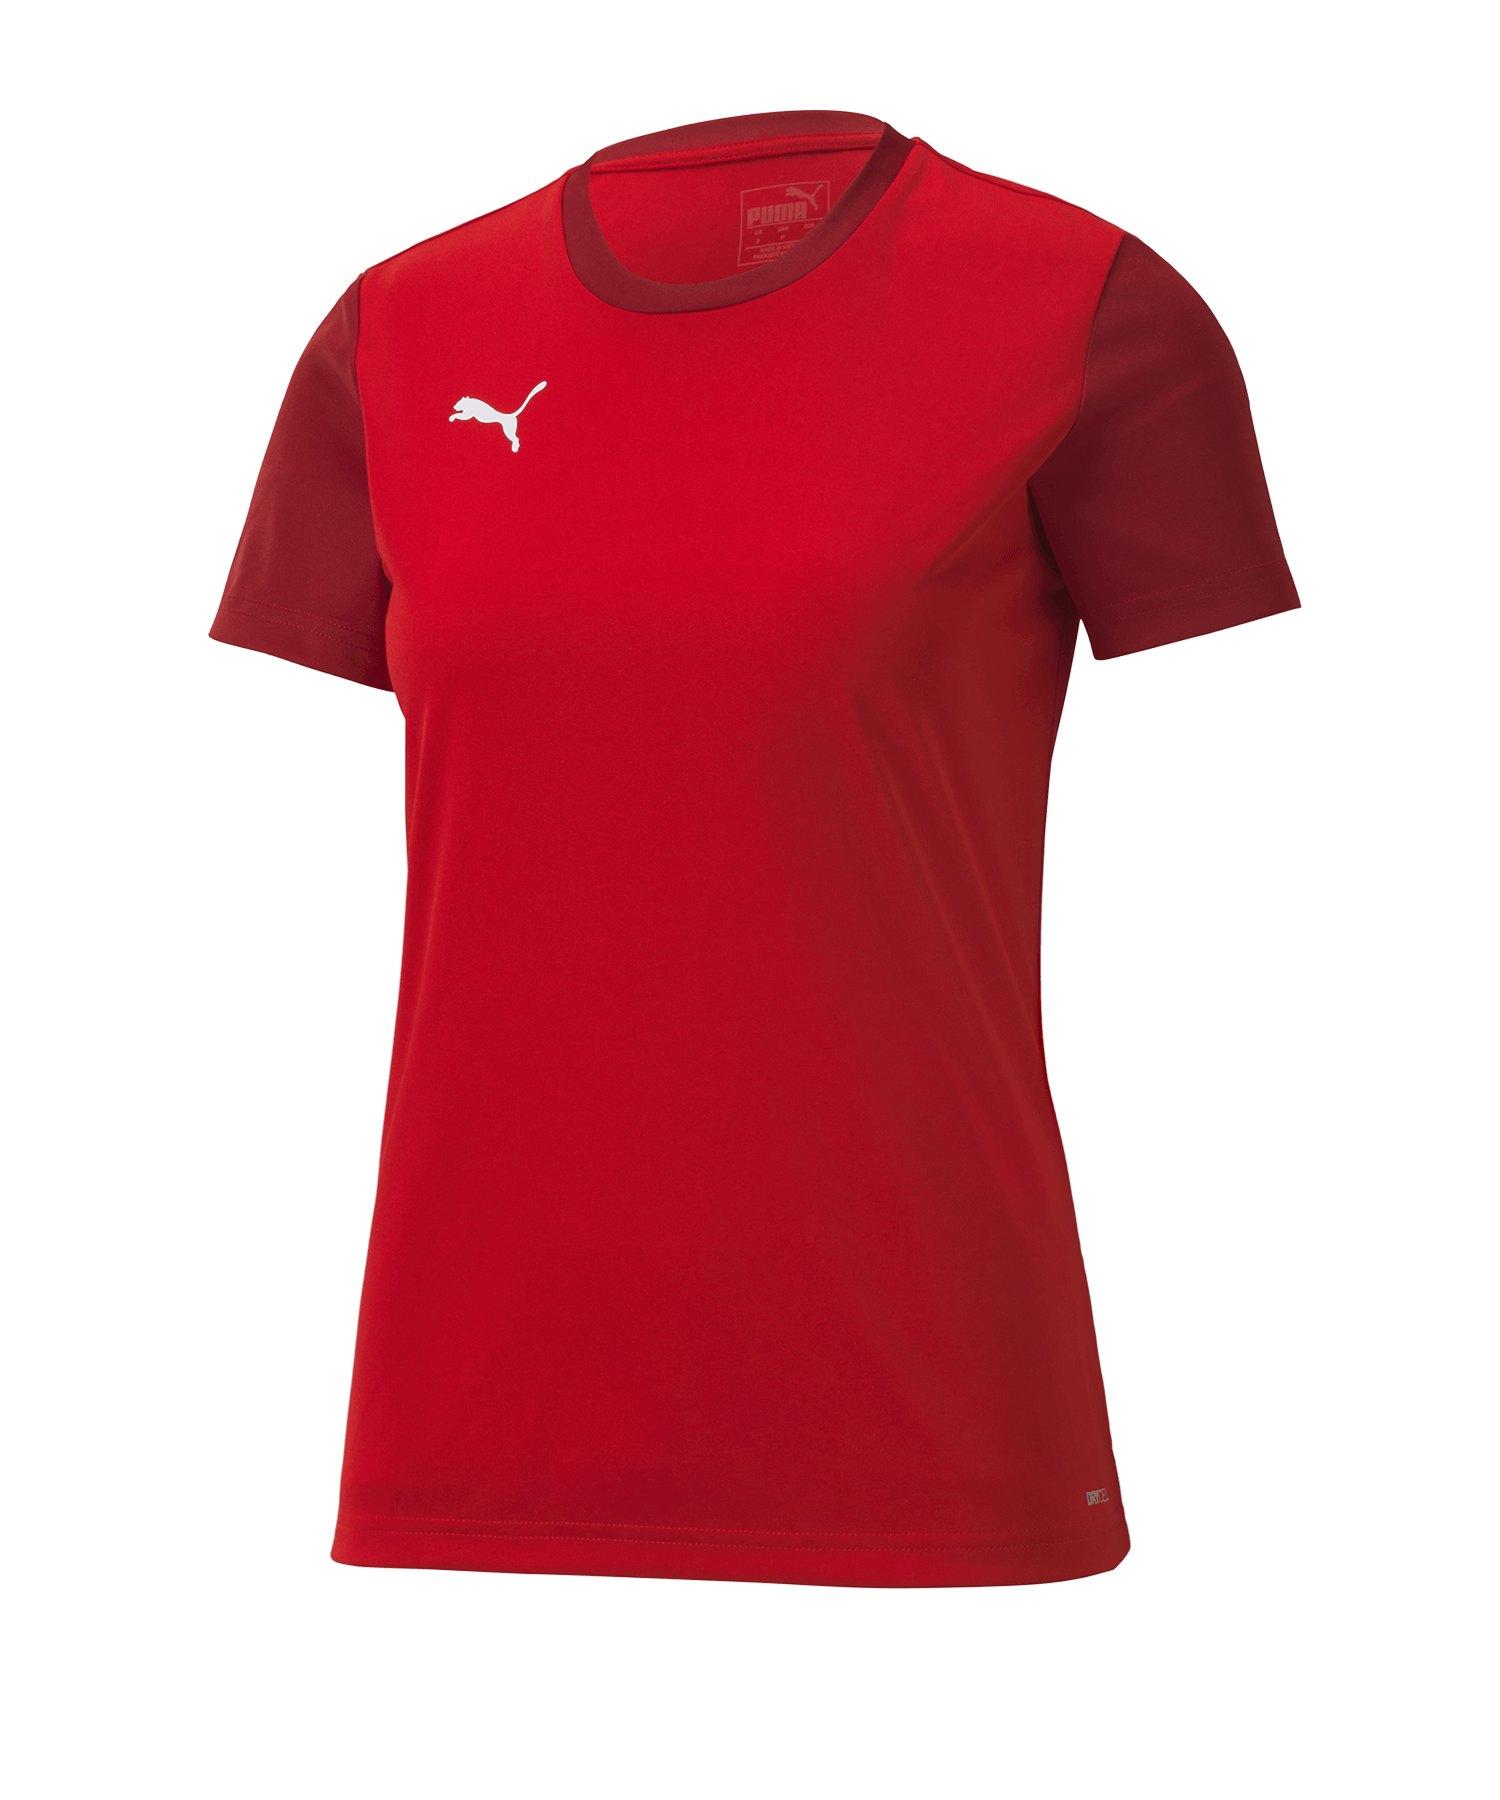 PUMA teamGOAL 23 Sideline Tee T-Shirt Damen F01 - rot